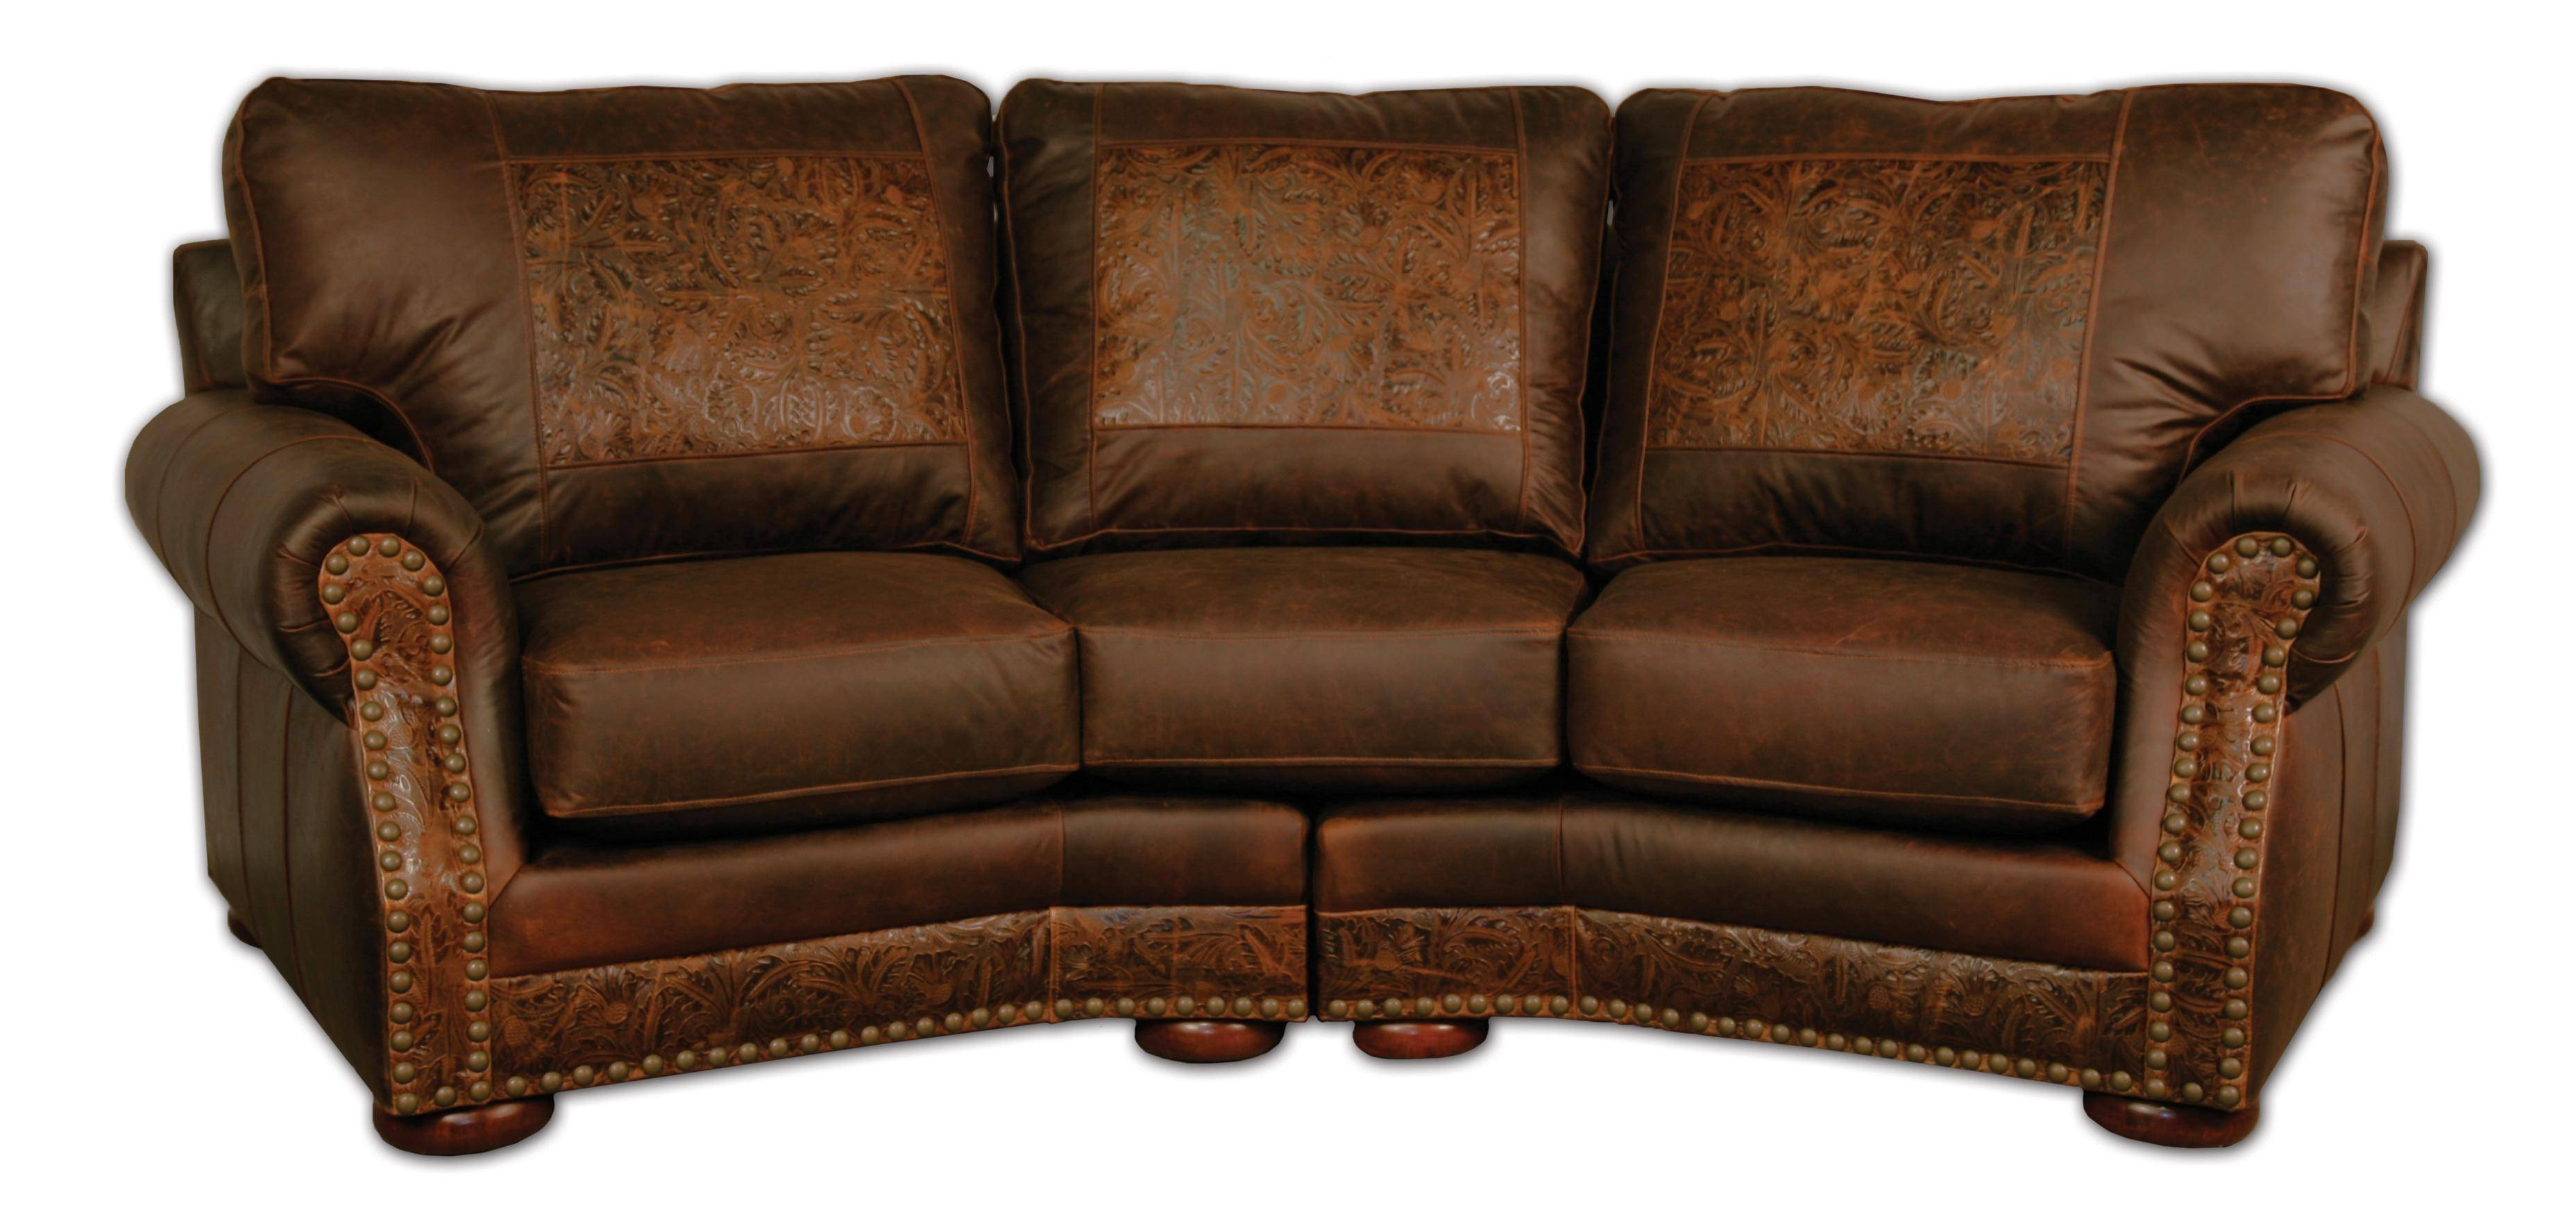 Sofa: Conversation Sofa Sectional Pertaining To Conversation Sofa Sectional (View 7 of 30)